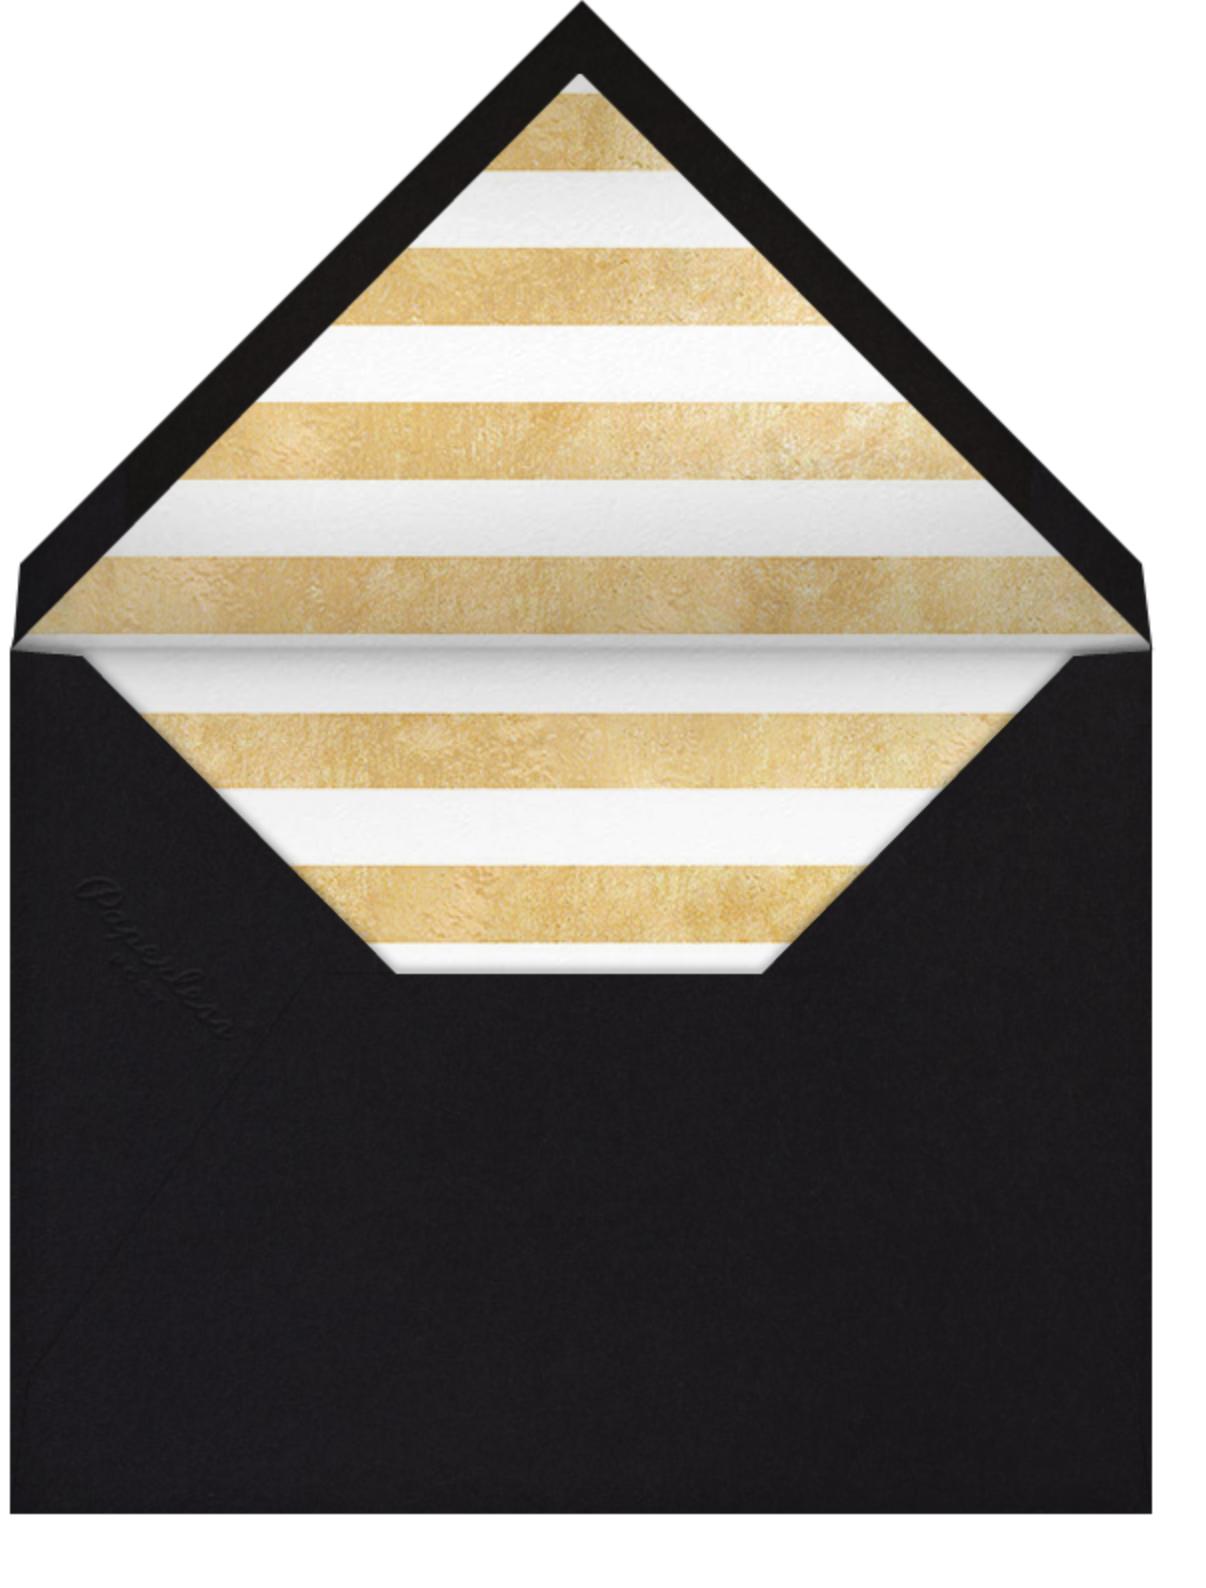 Black (Tall) - Paperless Post - Envelope